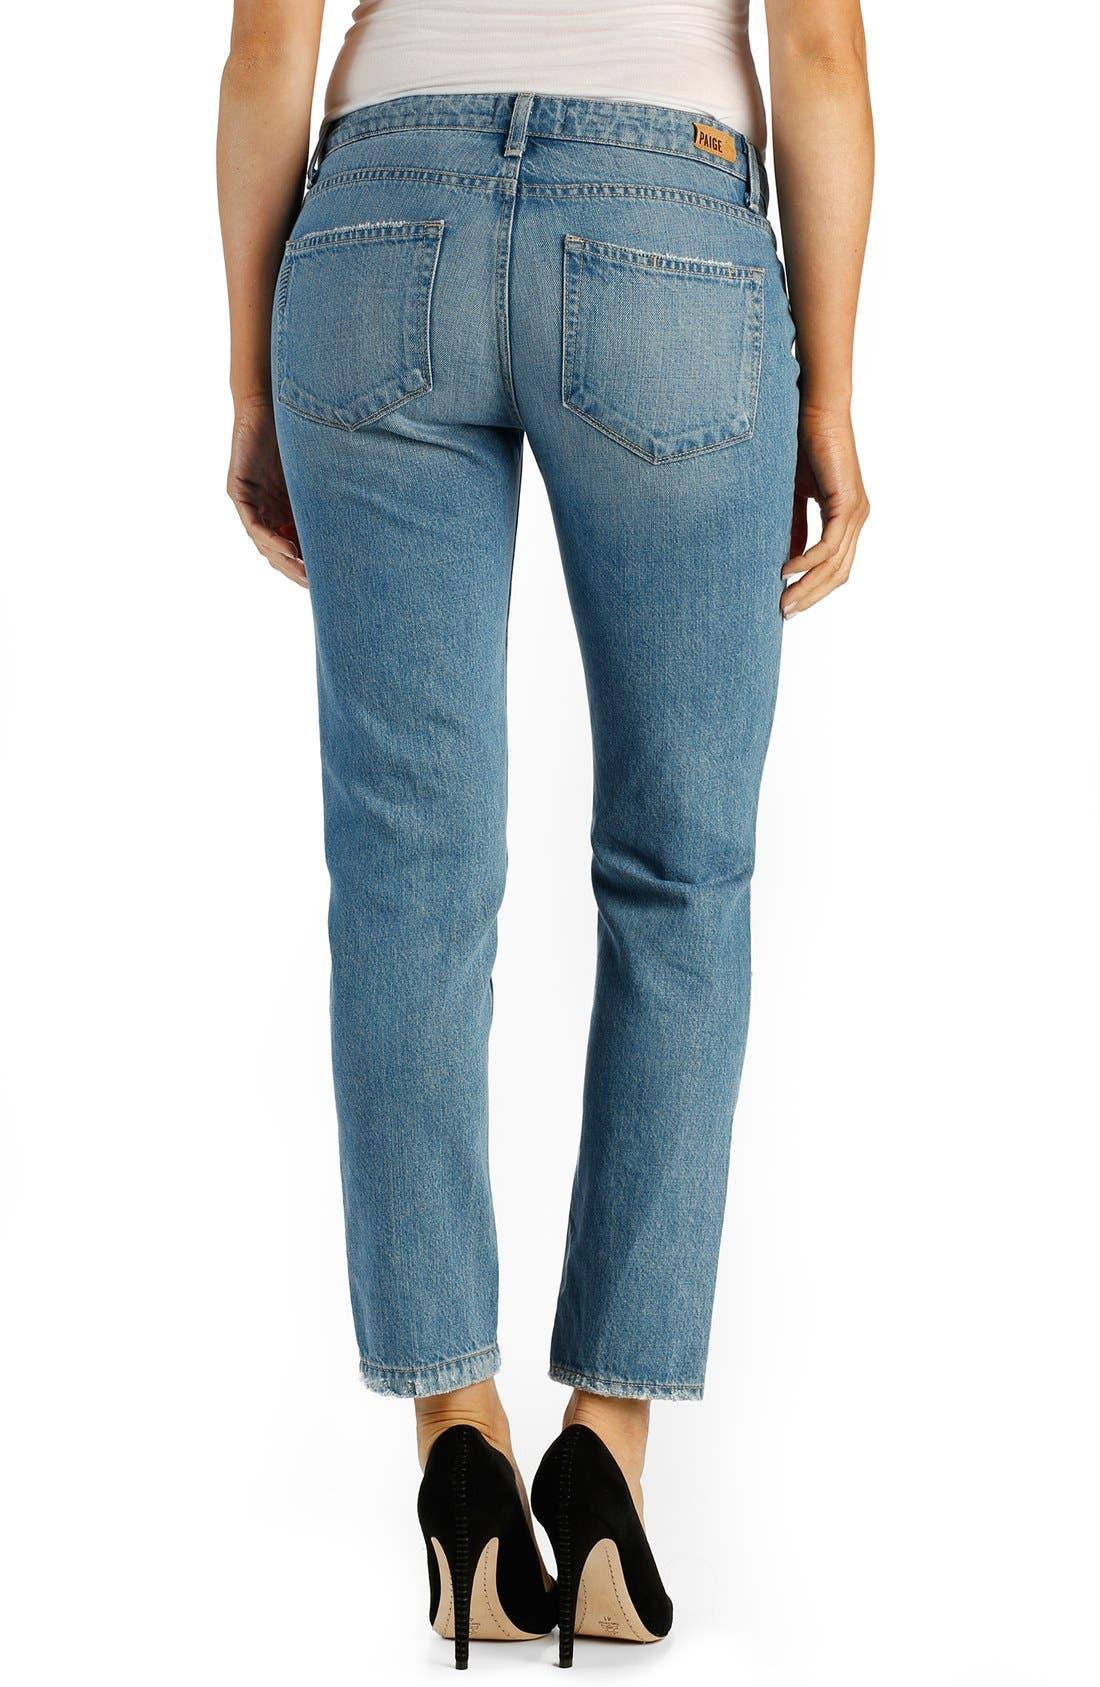 Denim 'Jimmy Jimmy' Ankle Boyfriend Skinny Jeans,                             Alternate thumbnail 2, color,                             400